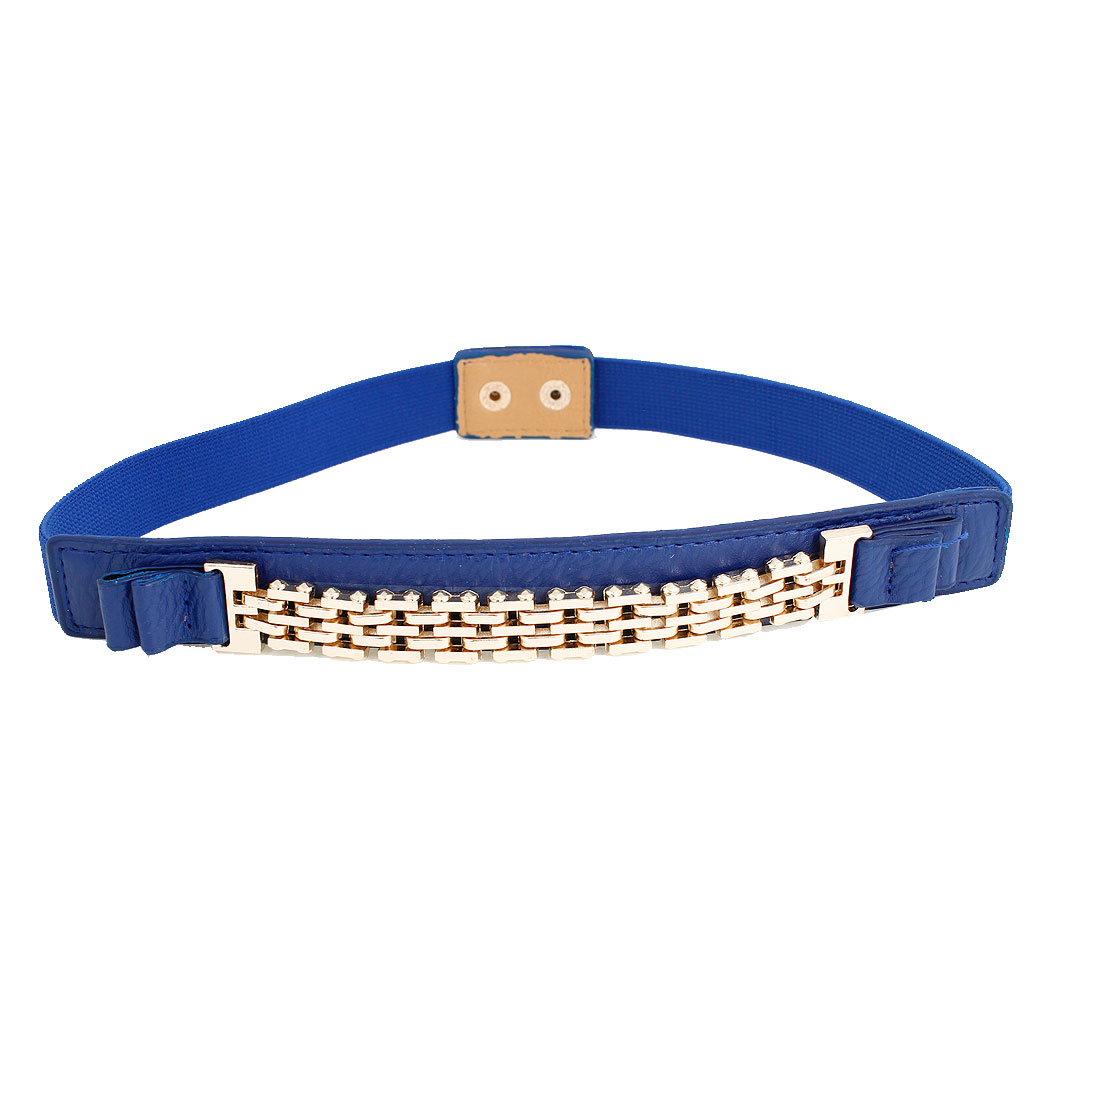 Lady Press Stud Button Buckle Stretchy Waist Belt Waistband Corset Band Blue